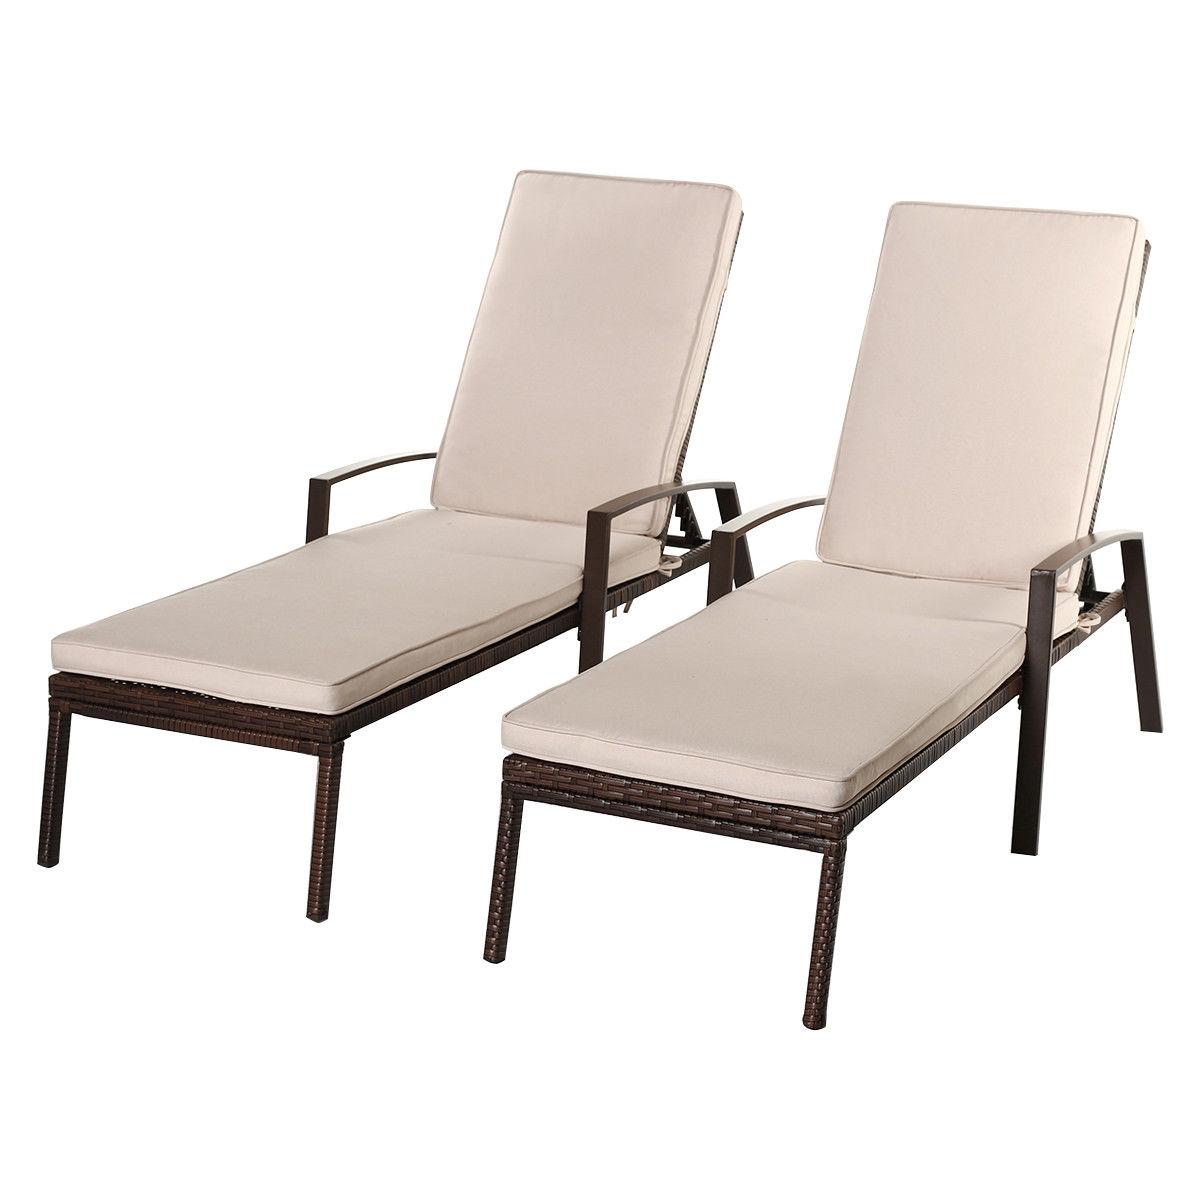 2 pcs Patio Rattan Adjustable Back Lounge Chair